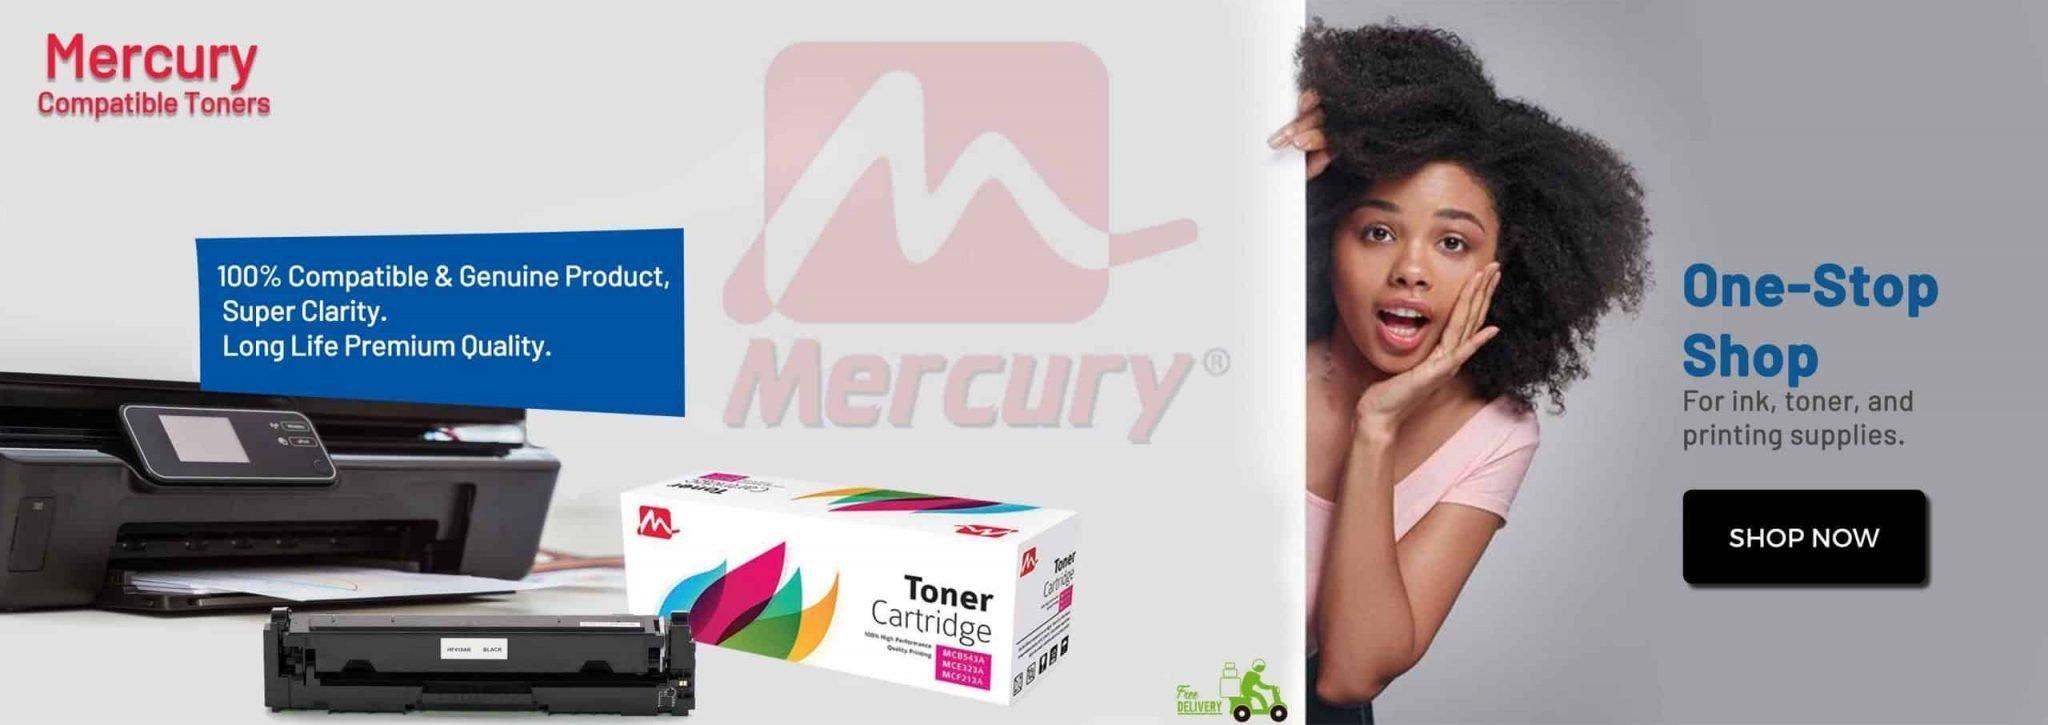 mercury compatible toners